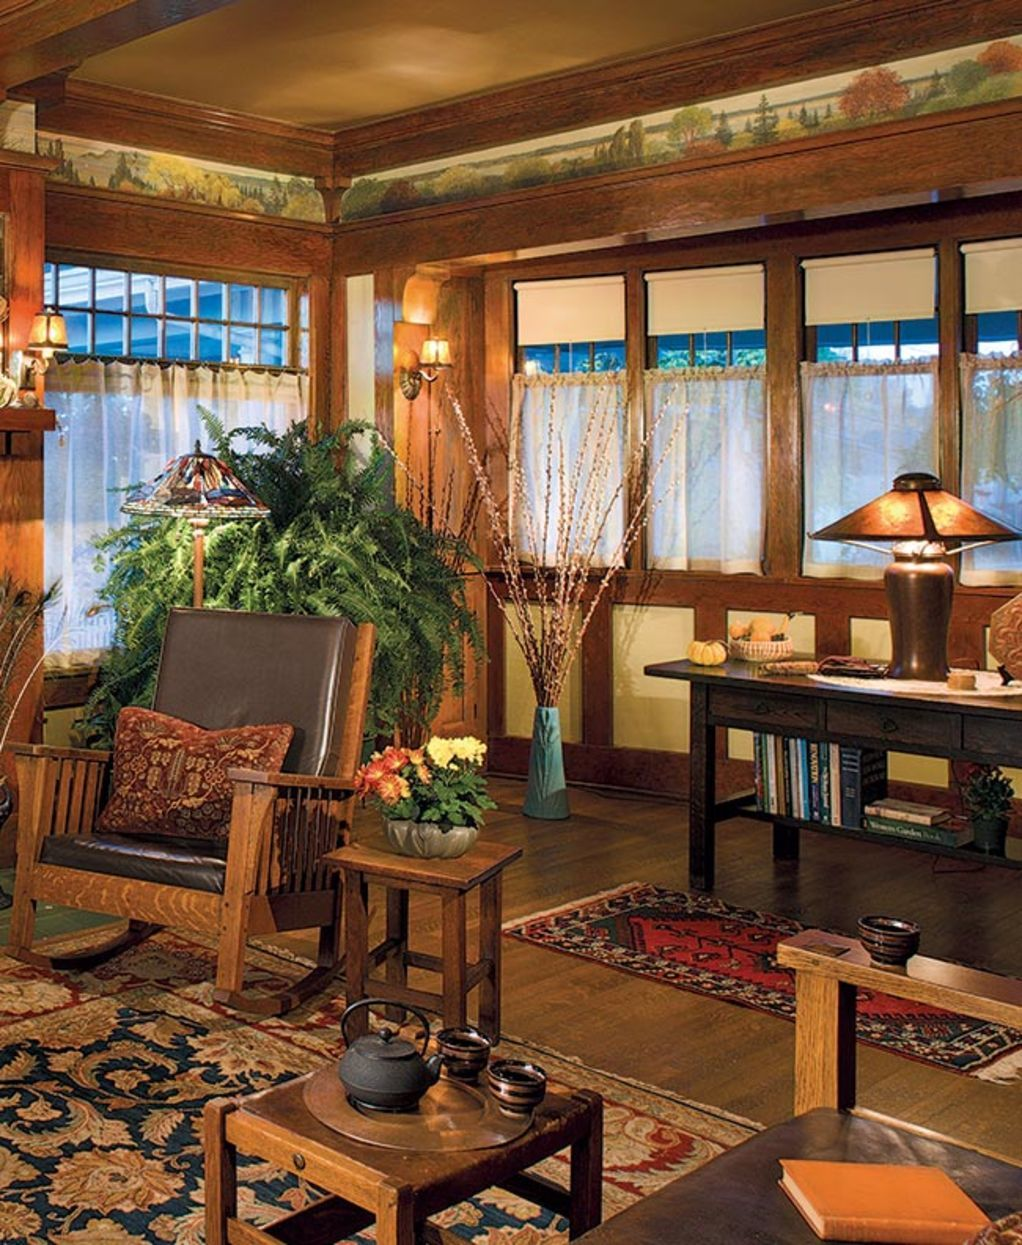 3 ideas for simple window treatments craftsman decor on extraordinary clever minimalist wardrobe ideas id=36198